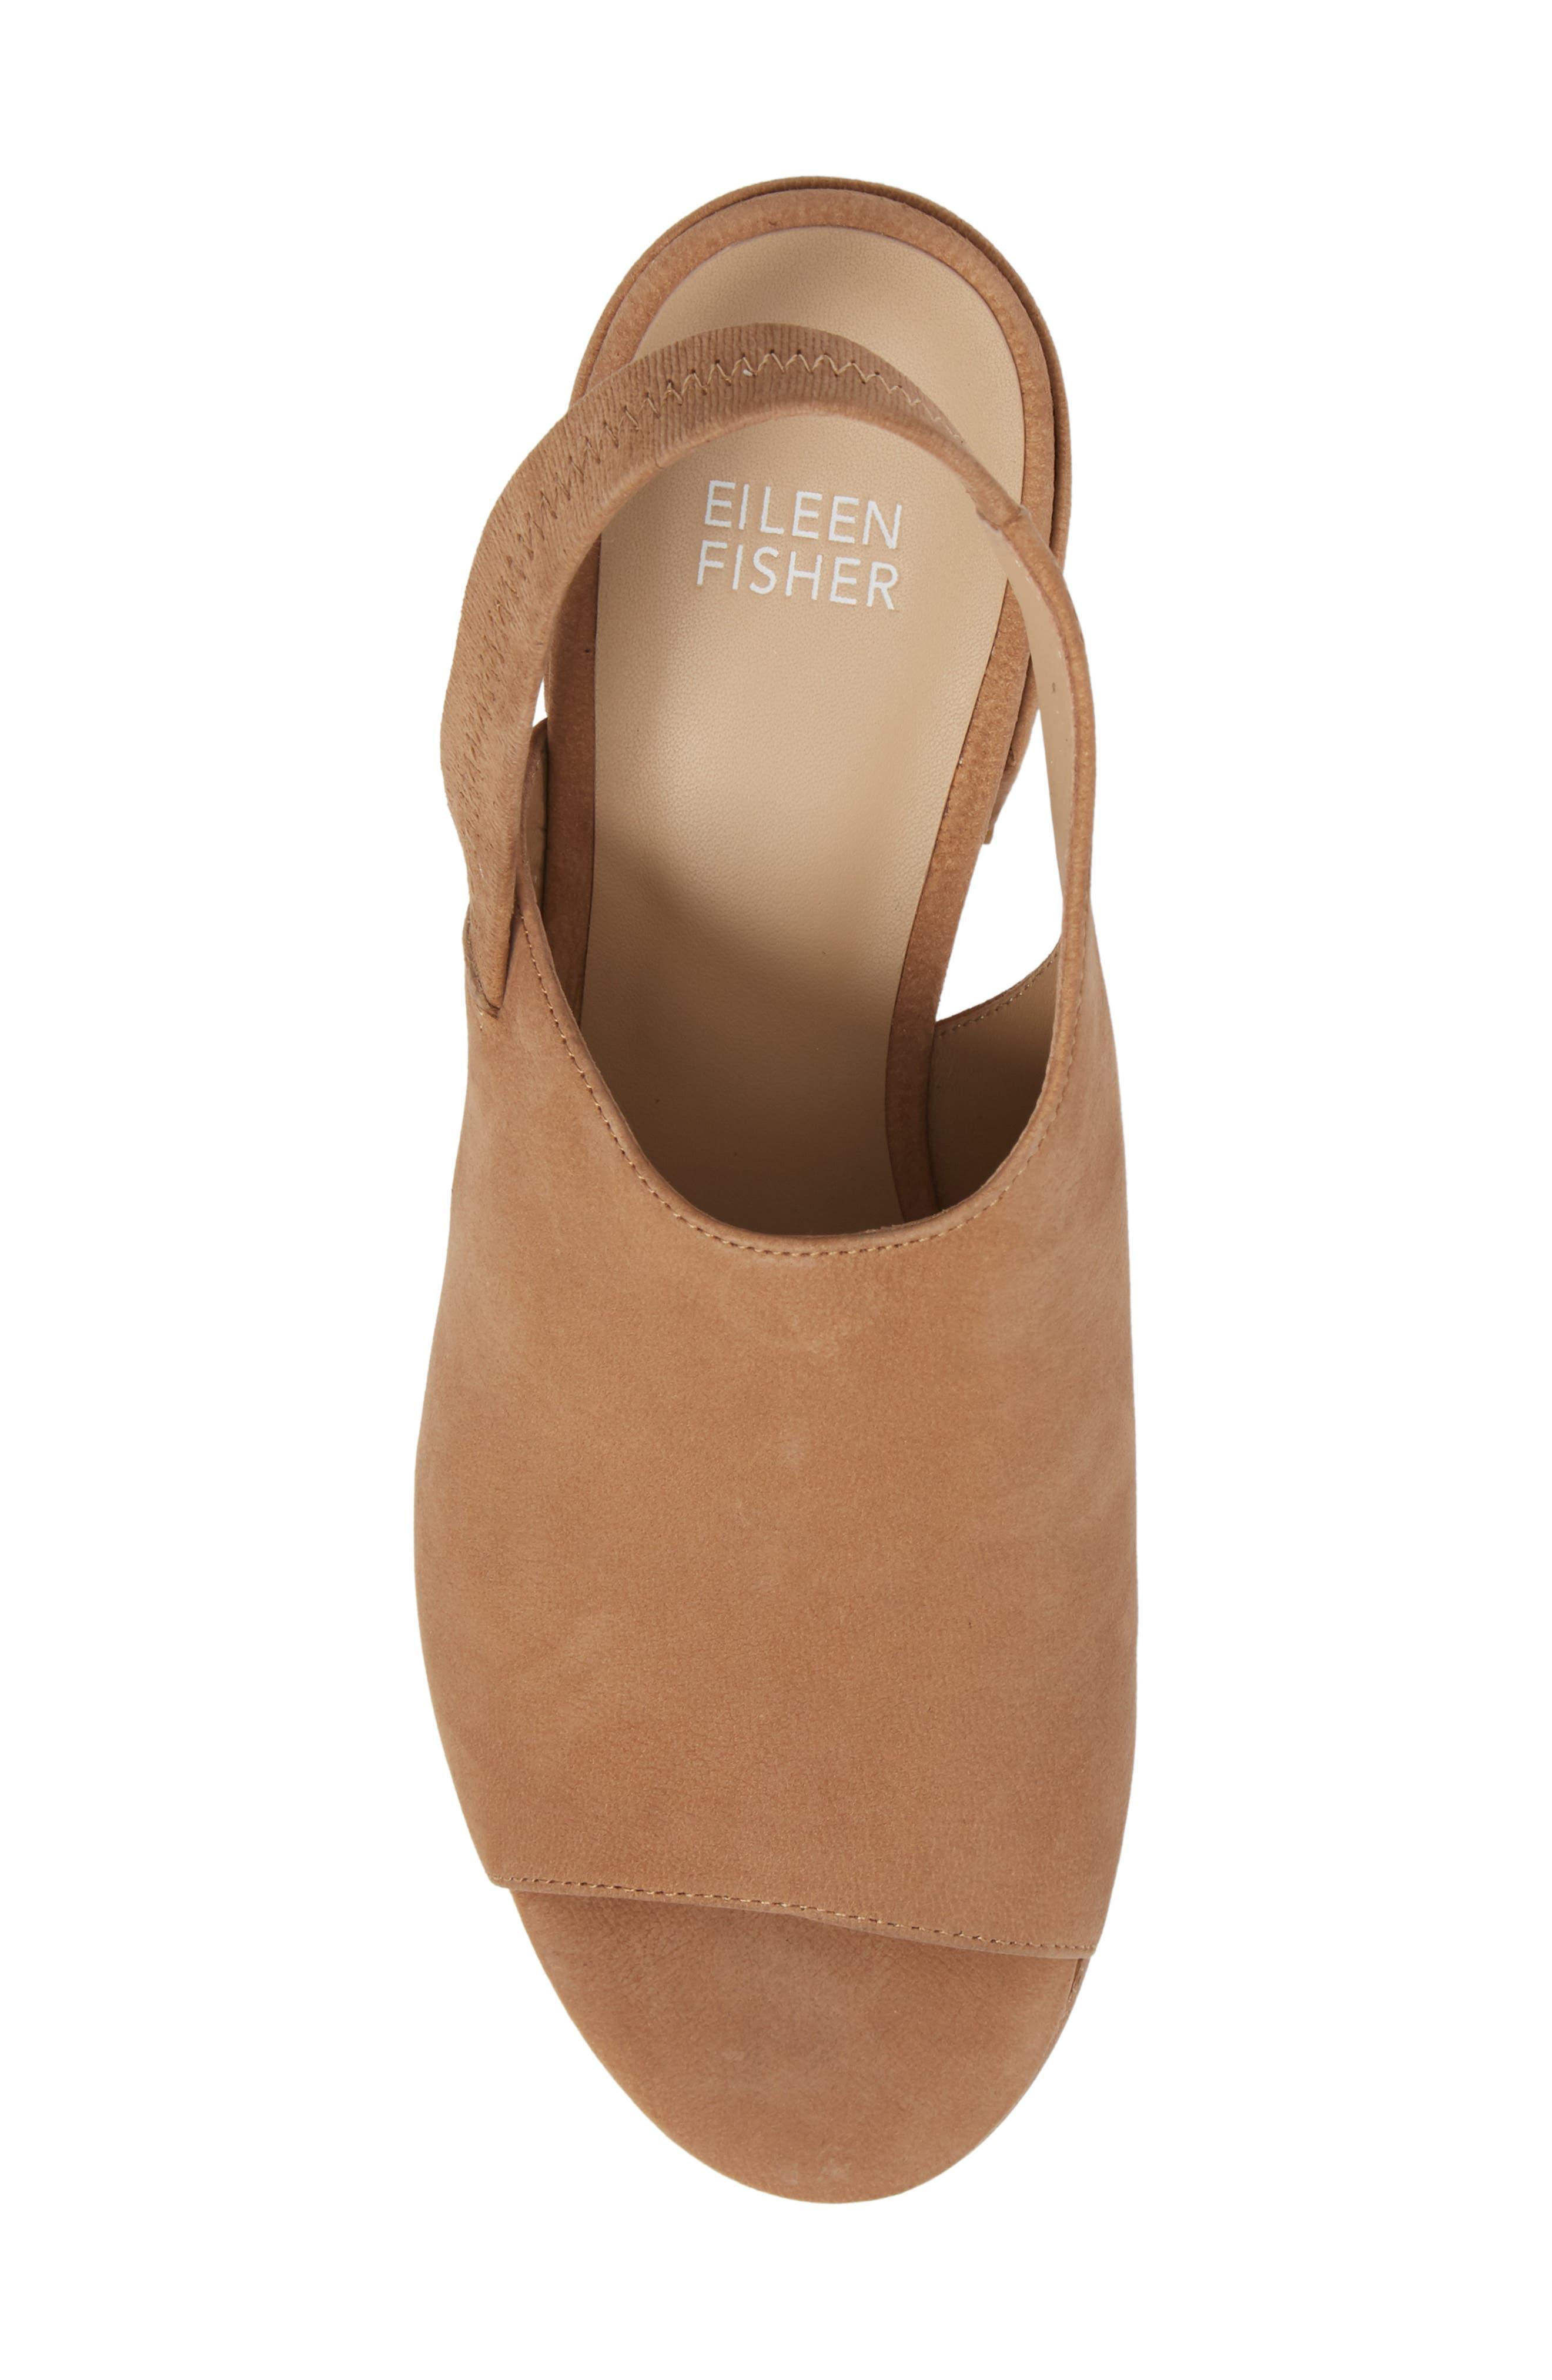 Leigh Asymmetrical Slingback Sandal,                             Alternate thumbnail 4, color,                             Wheat Leather